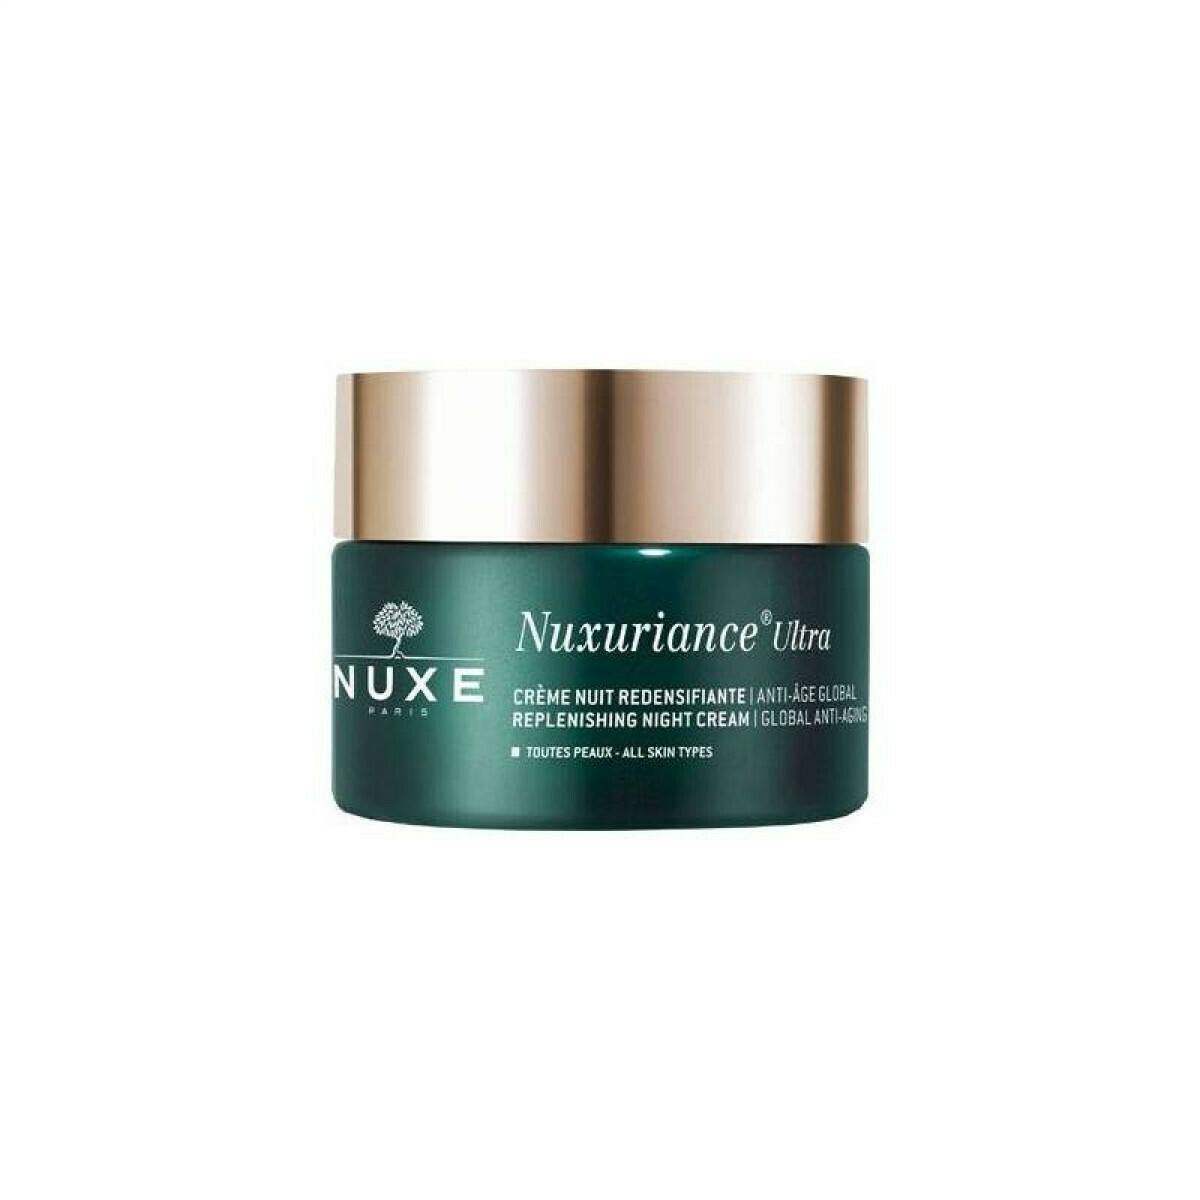 Nuxuriance Ultra Creme Nuit-Κρεμα Νυχτας 50 ml